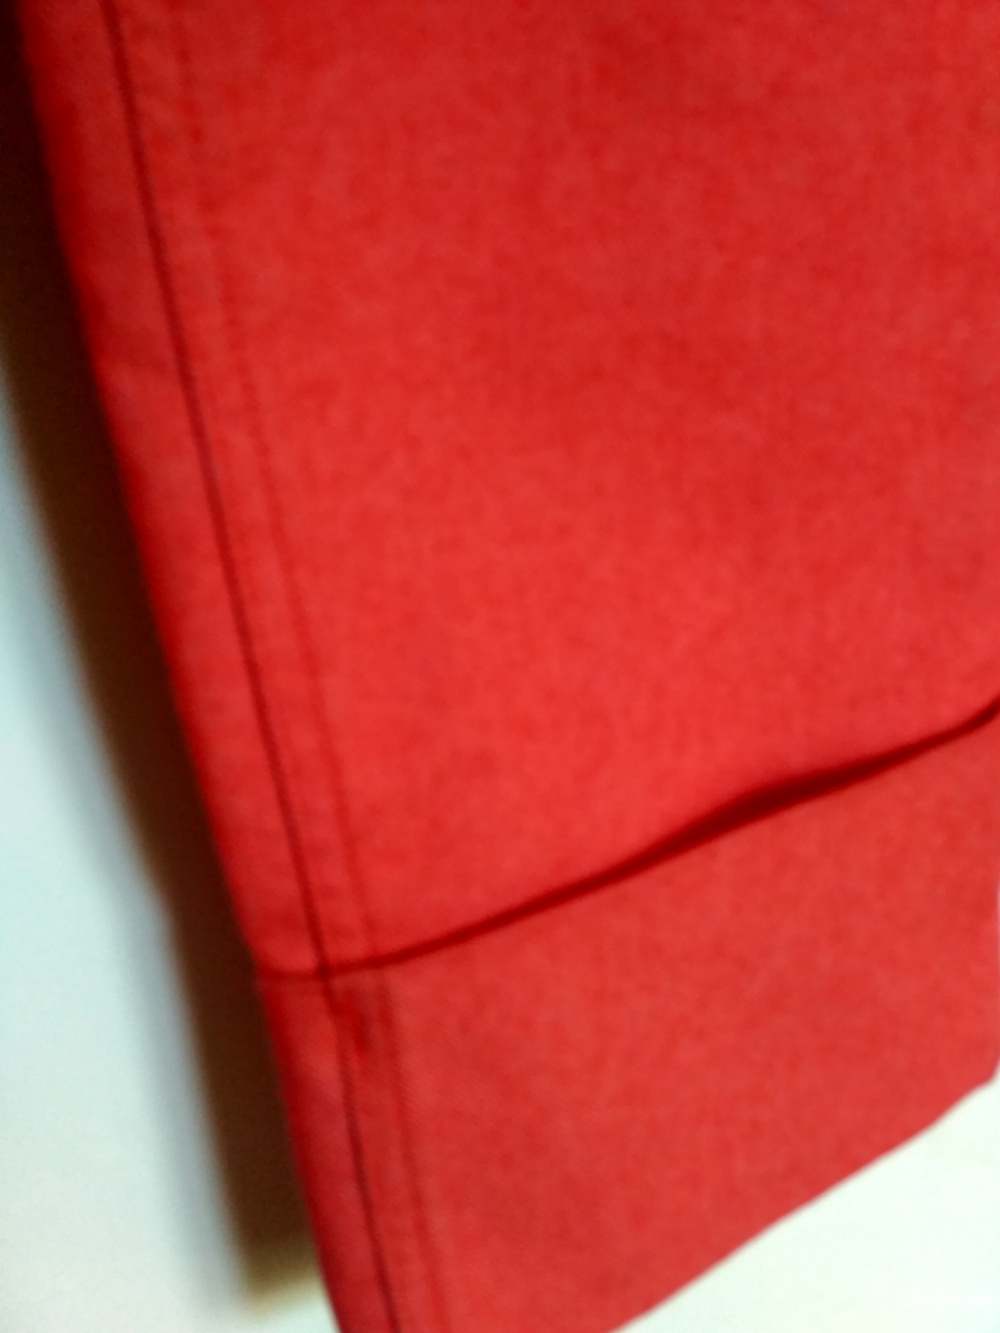 Джинсы CK CELVIN KLEIN jeans 29 маркировка маломерят